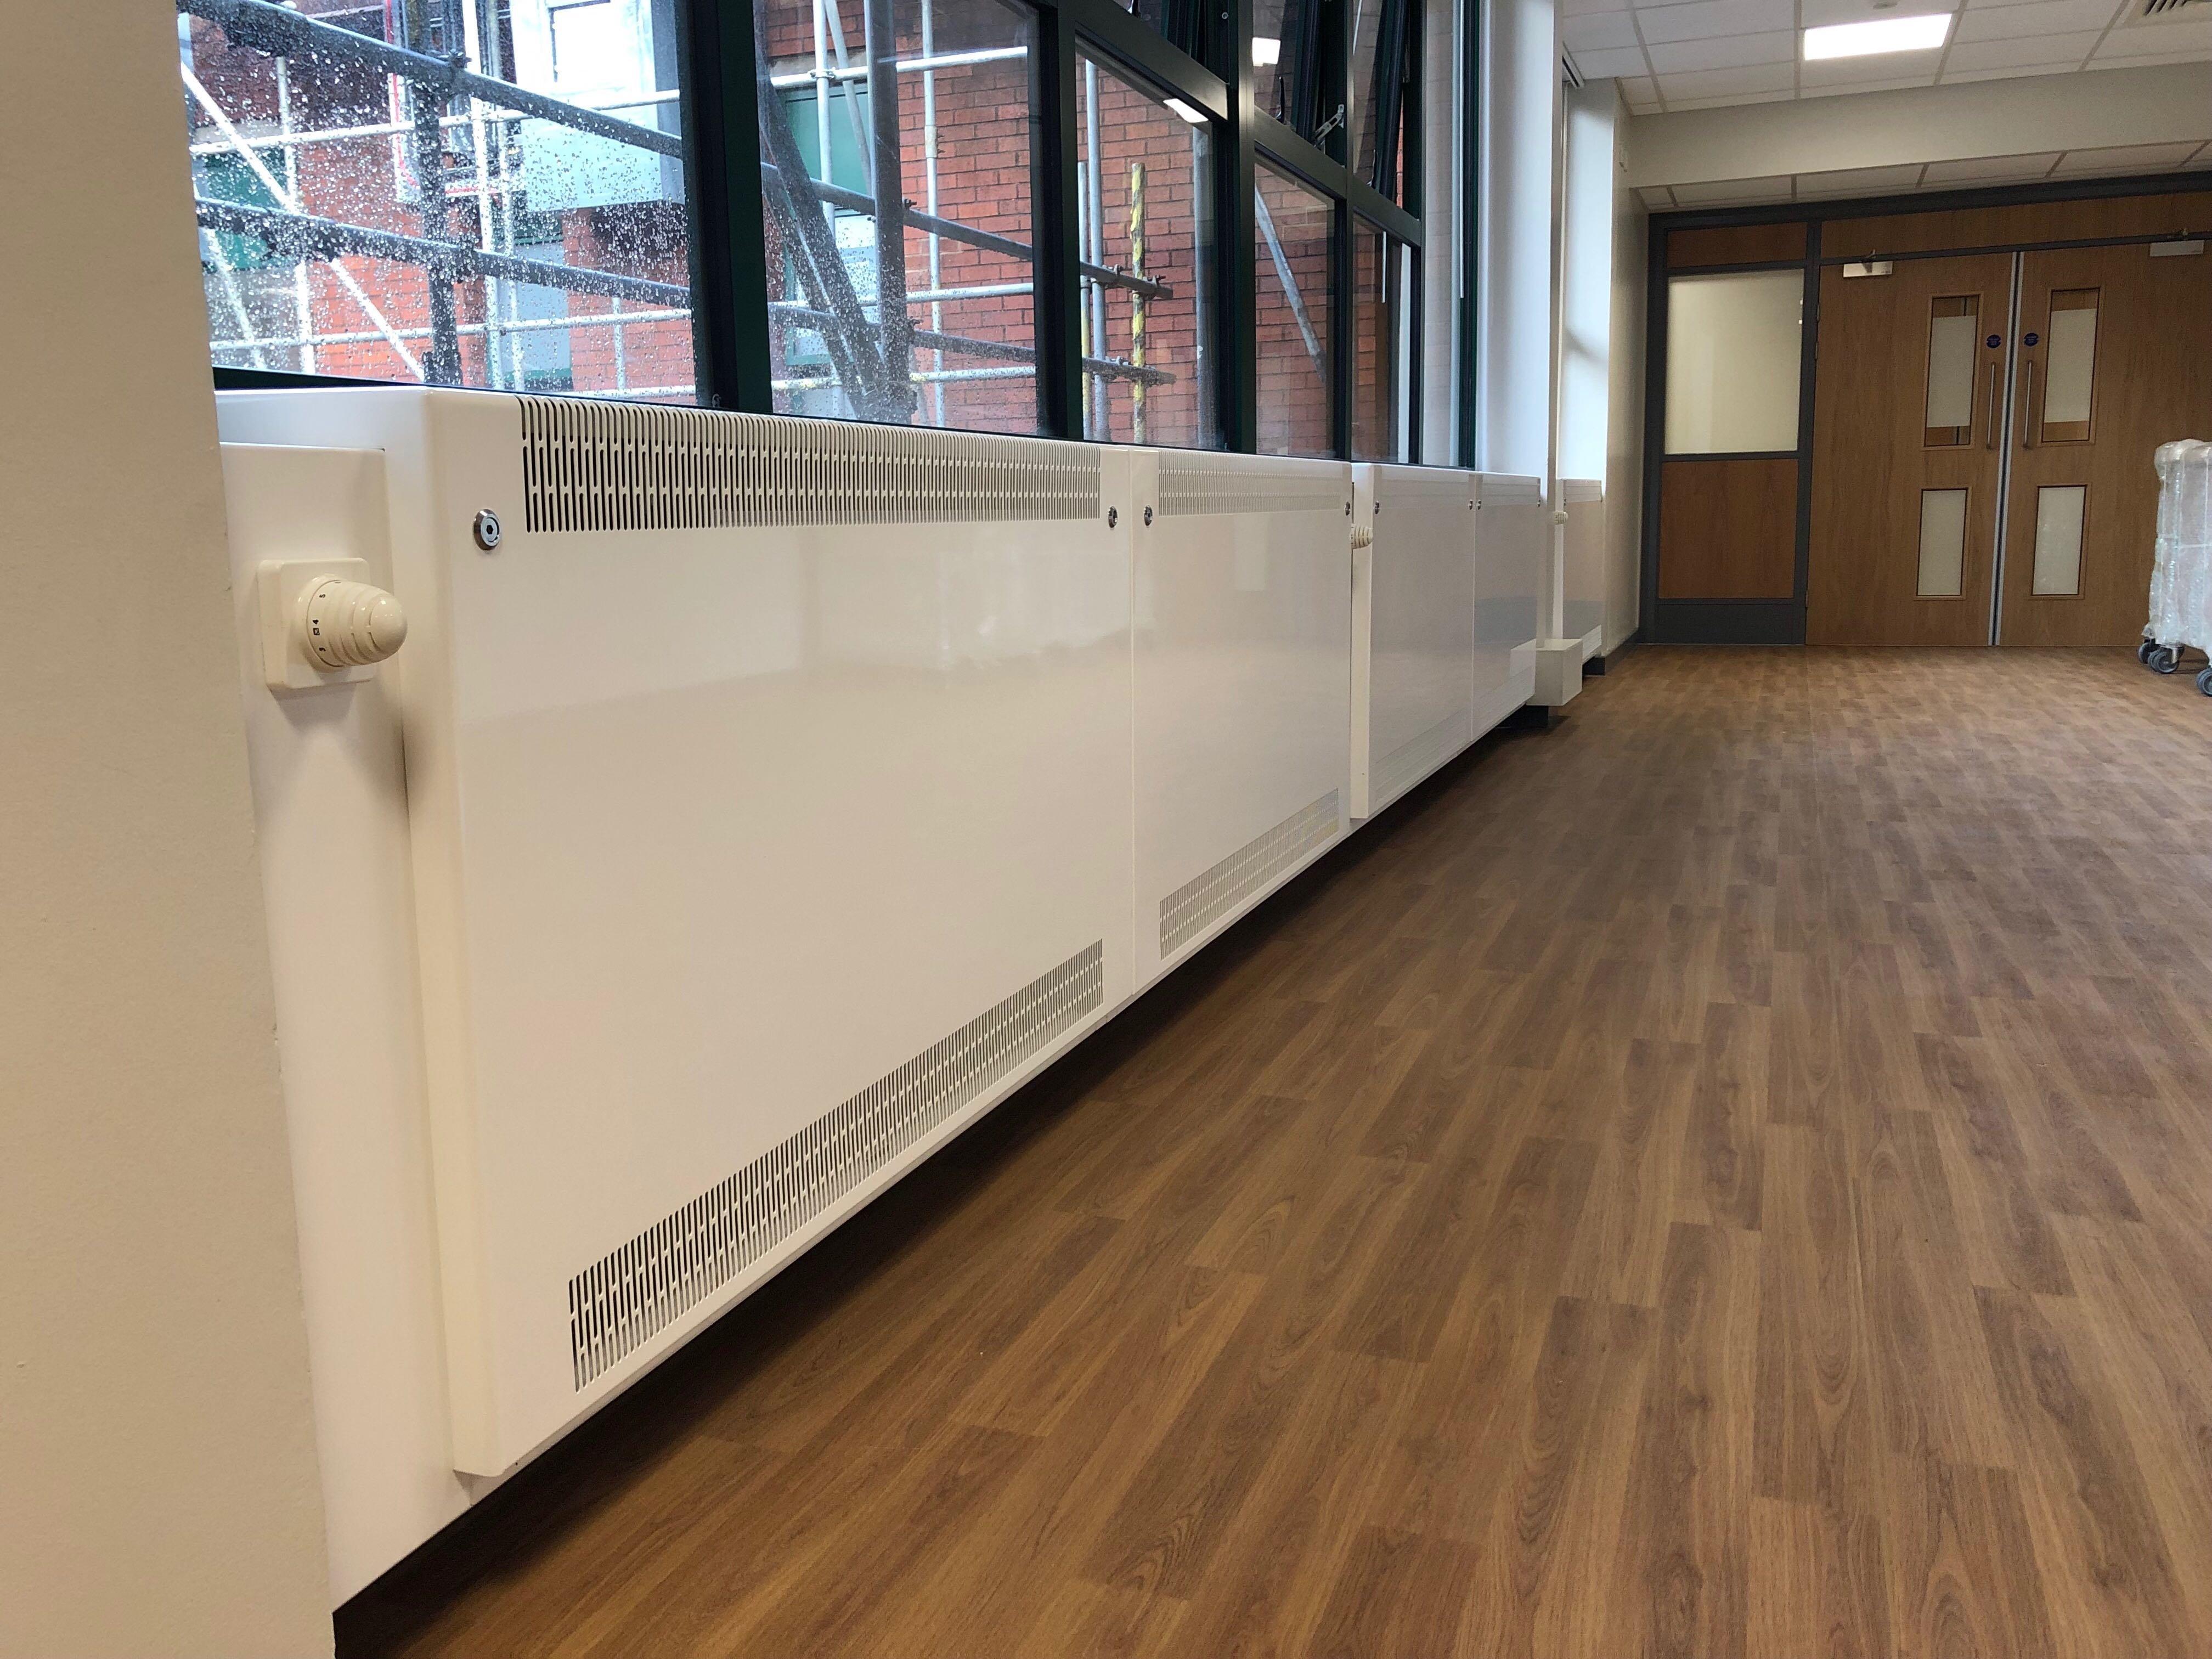 LST radiators wall to wall